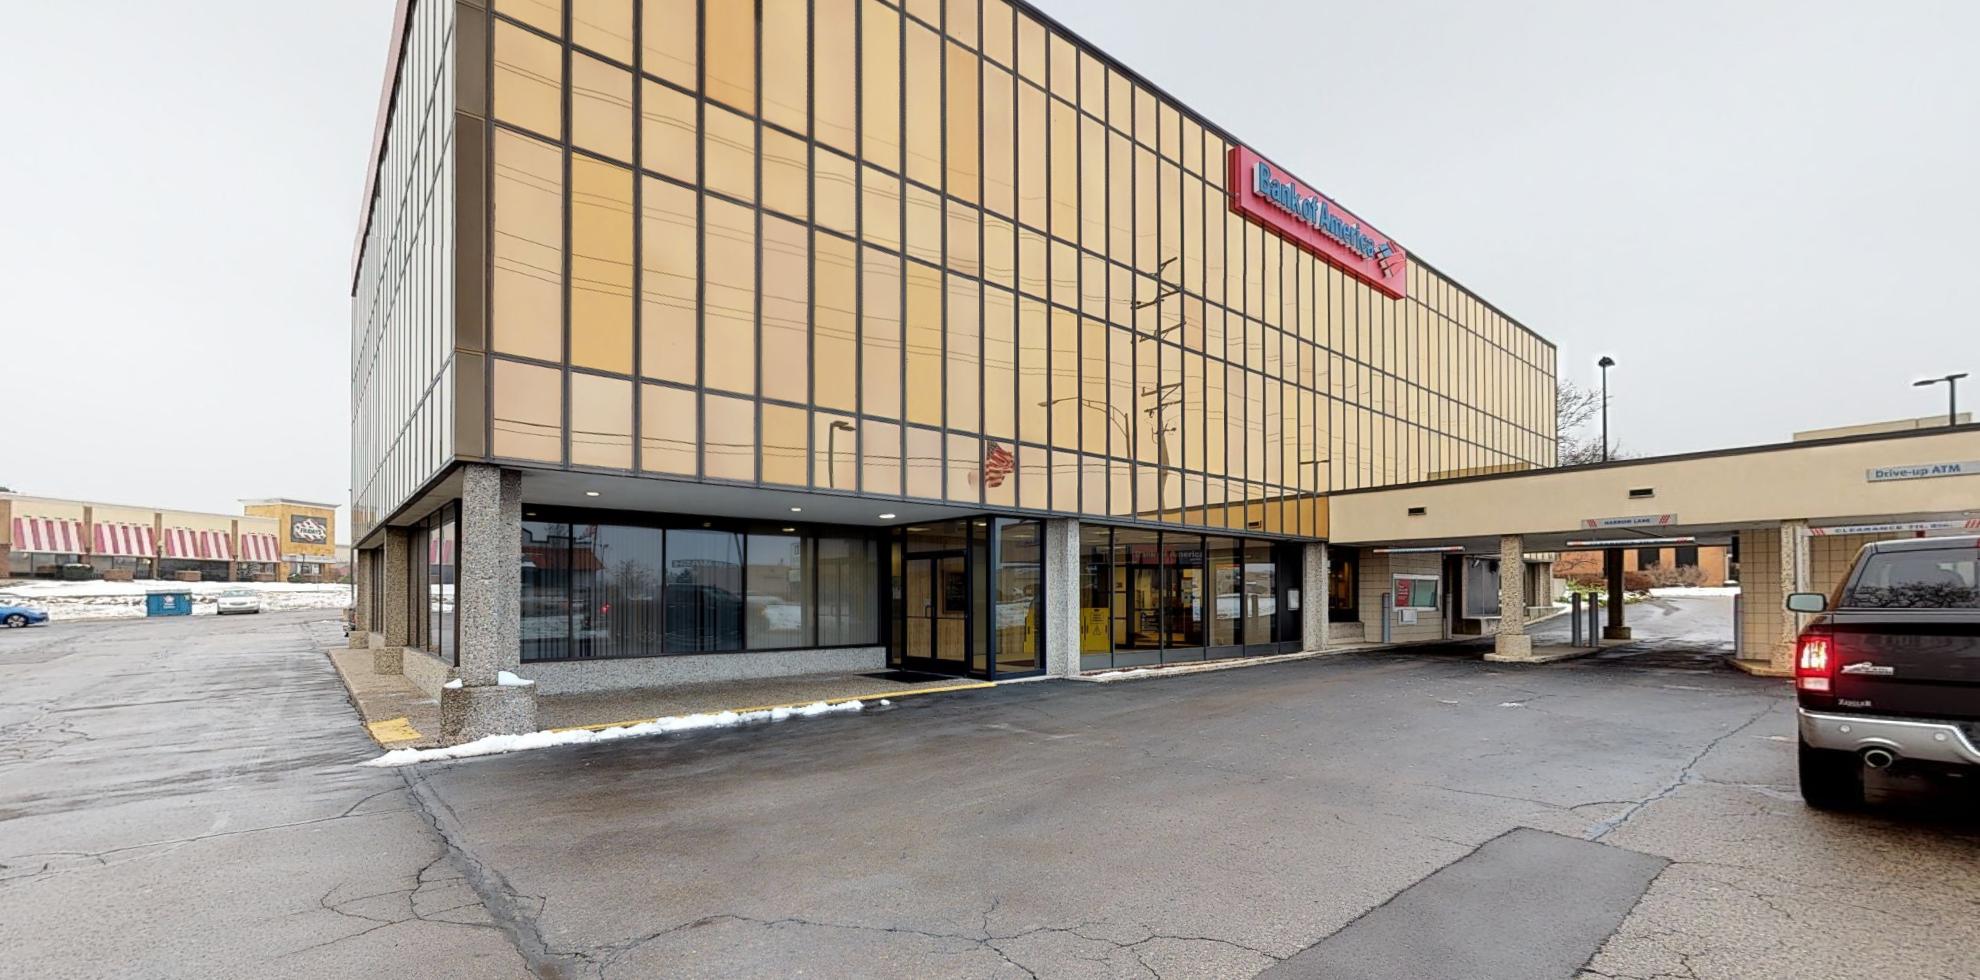 Bank of America financial center with drive-thru ATM | 2627 E Beltline Ave SE, Grand Rapids, MI 49546